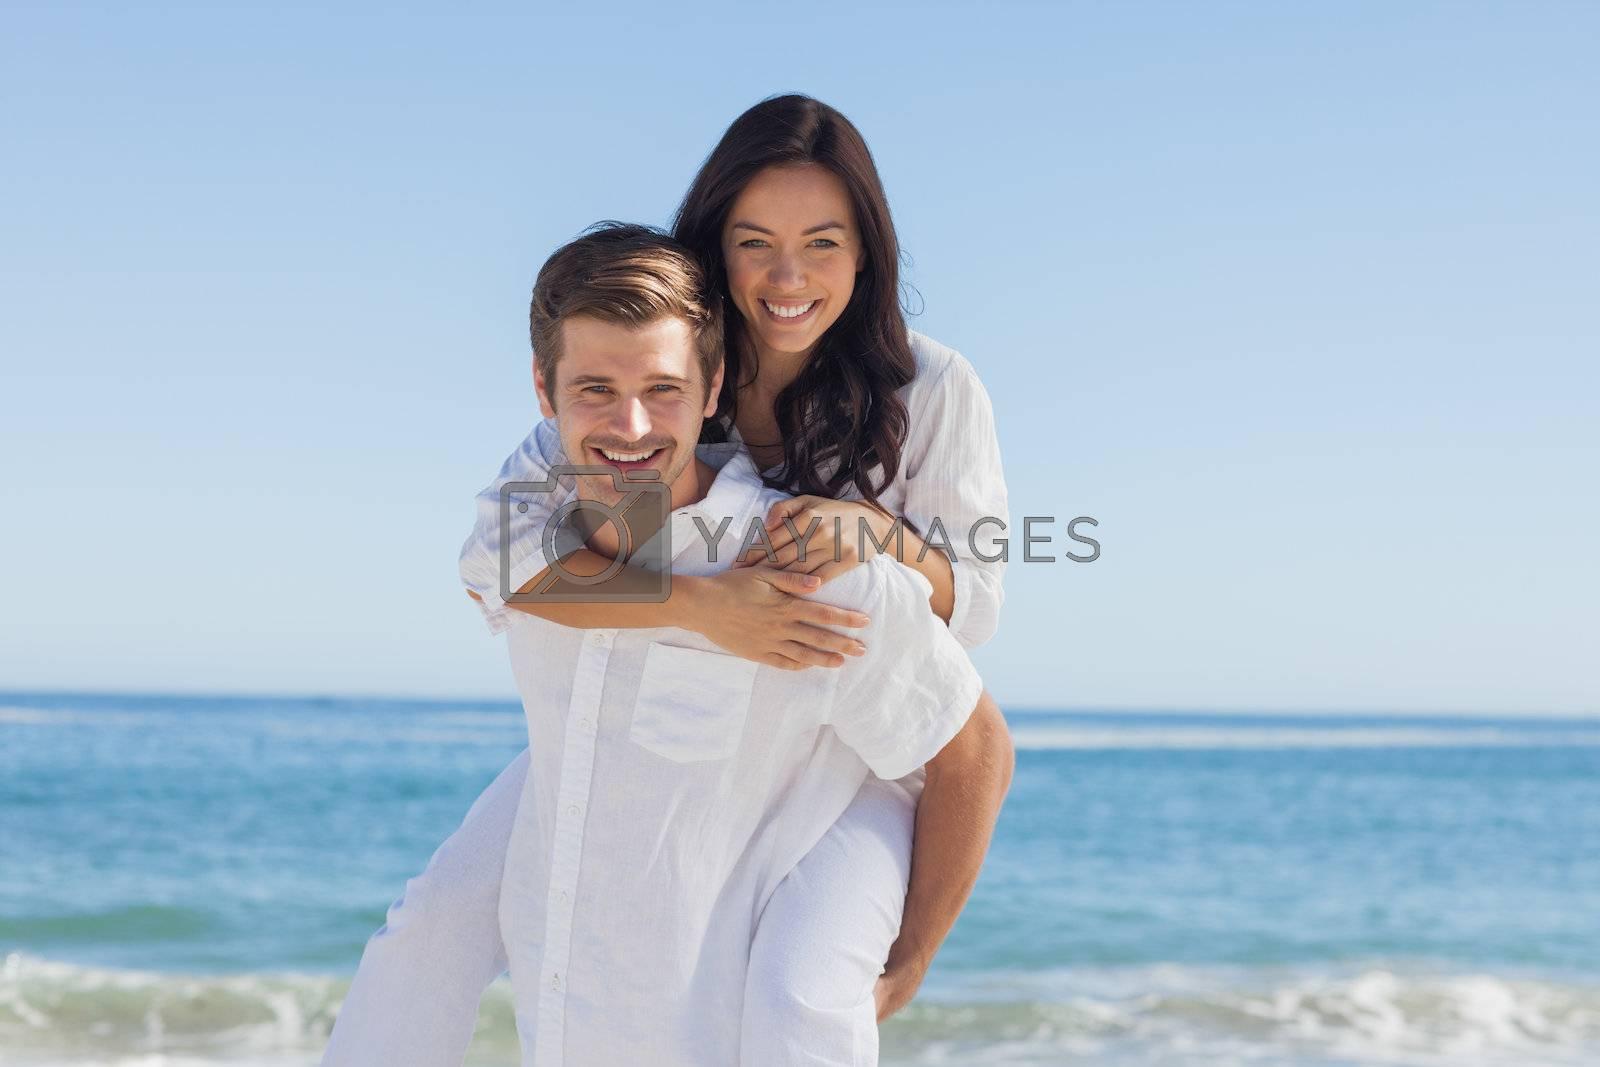 Happy couple smiling at camera by Wavebreakmedia